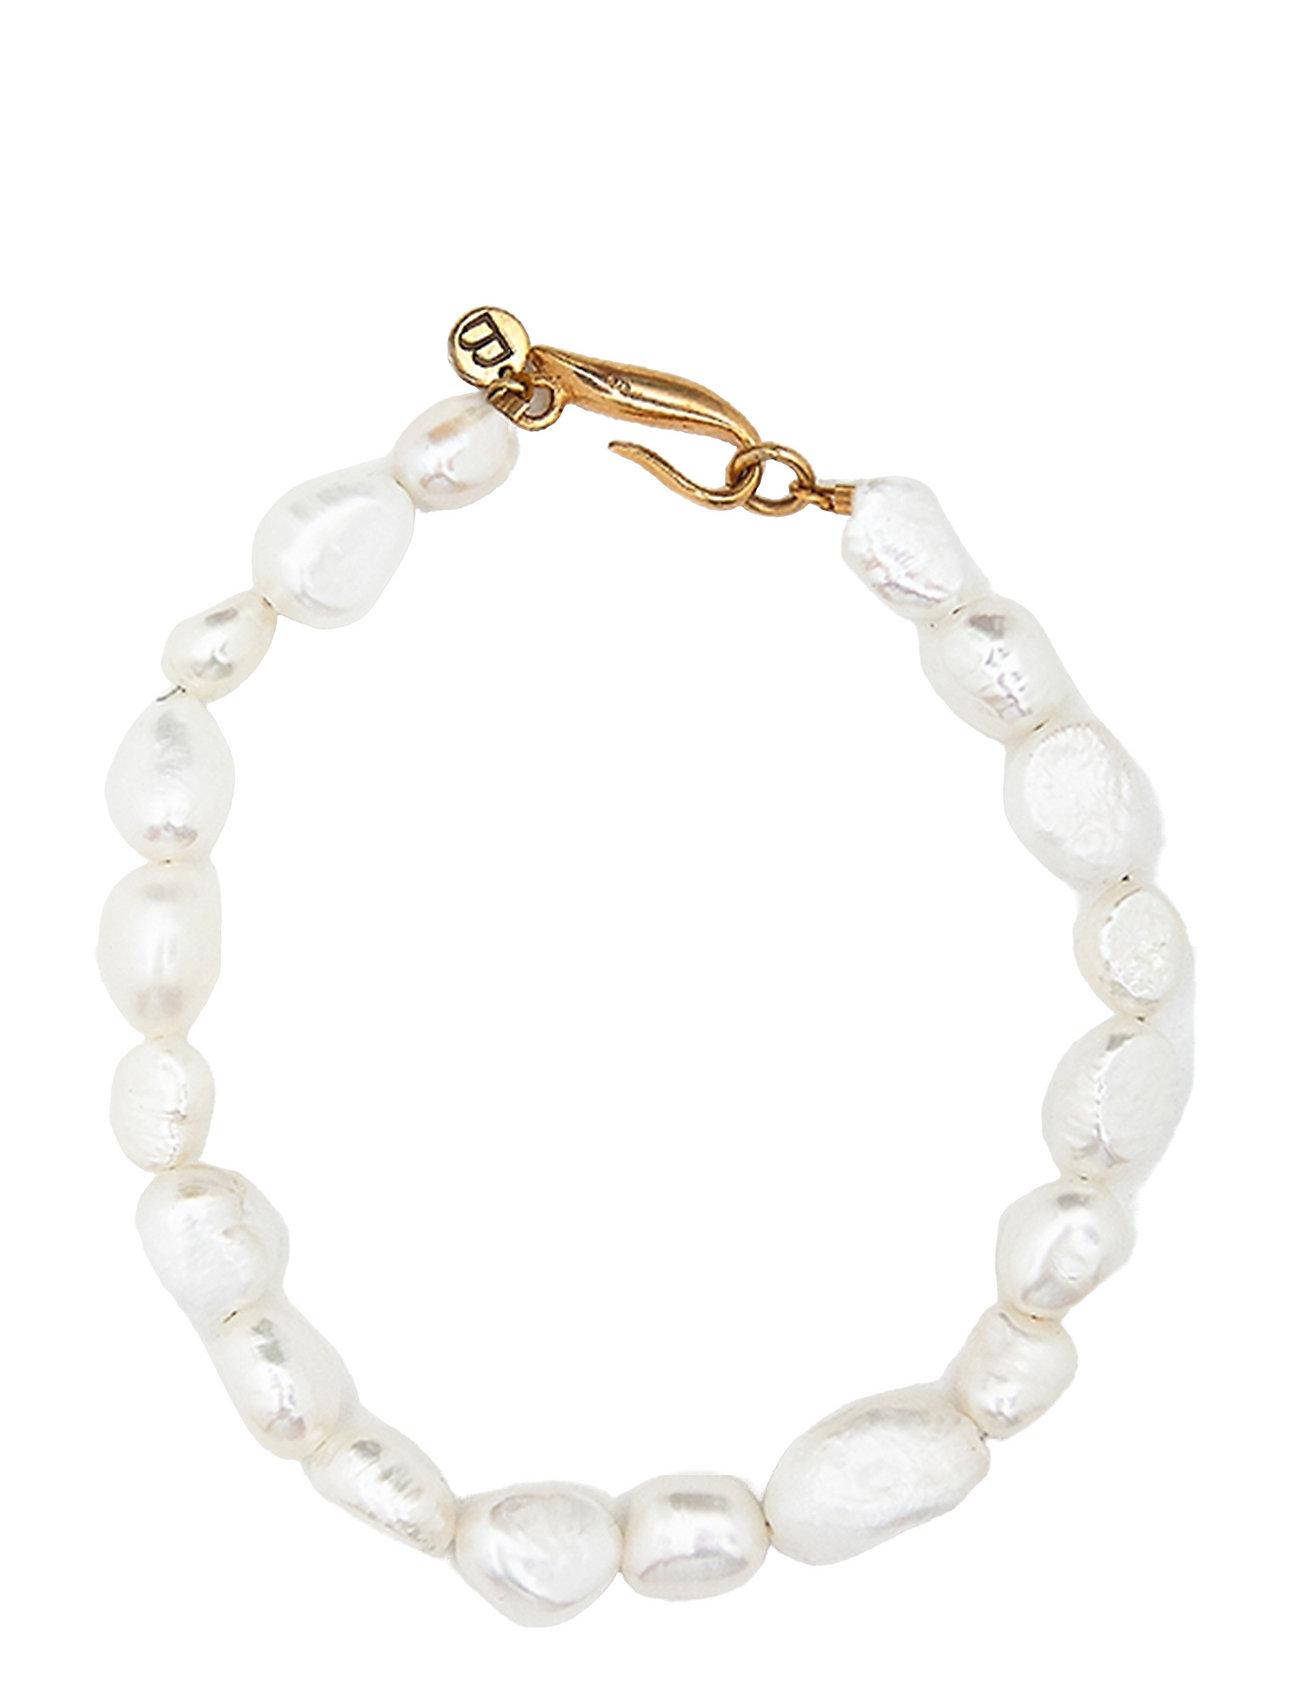 Irregular Pearls Bracelet Accessories Jewellery Bracelets Chain Bracelets Guld Blue Billie